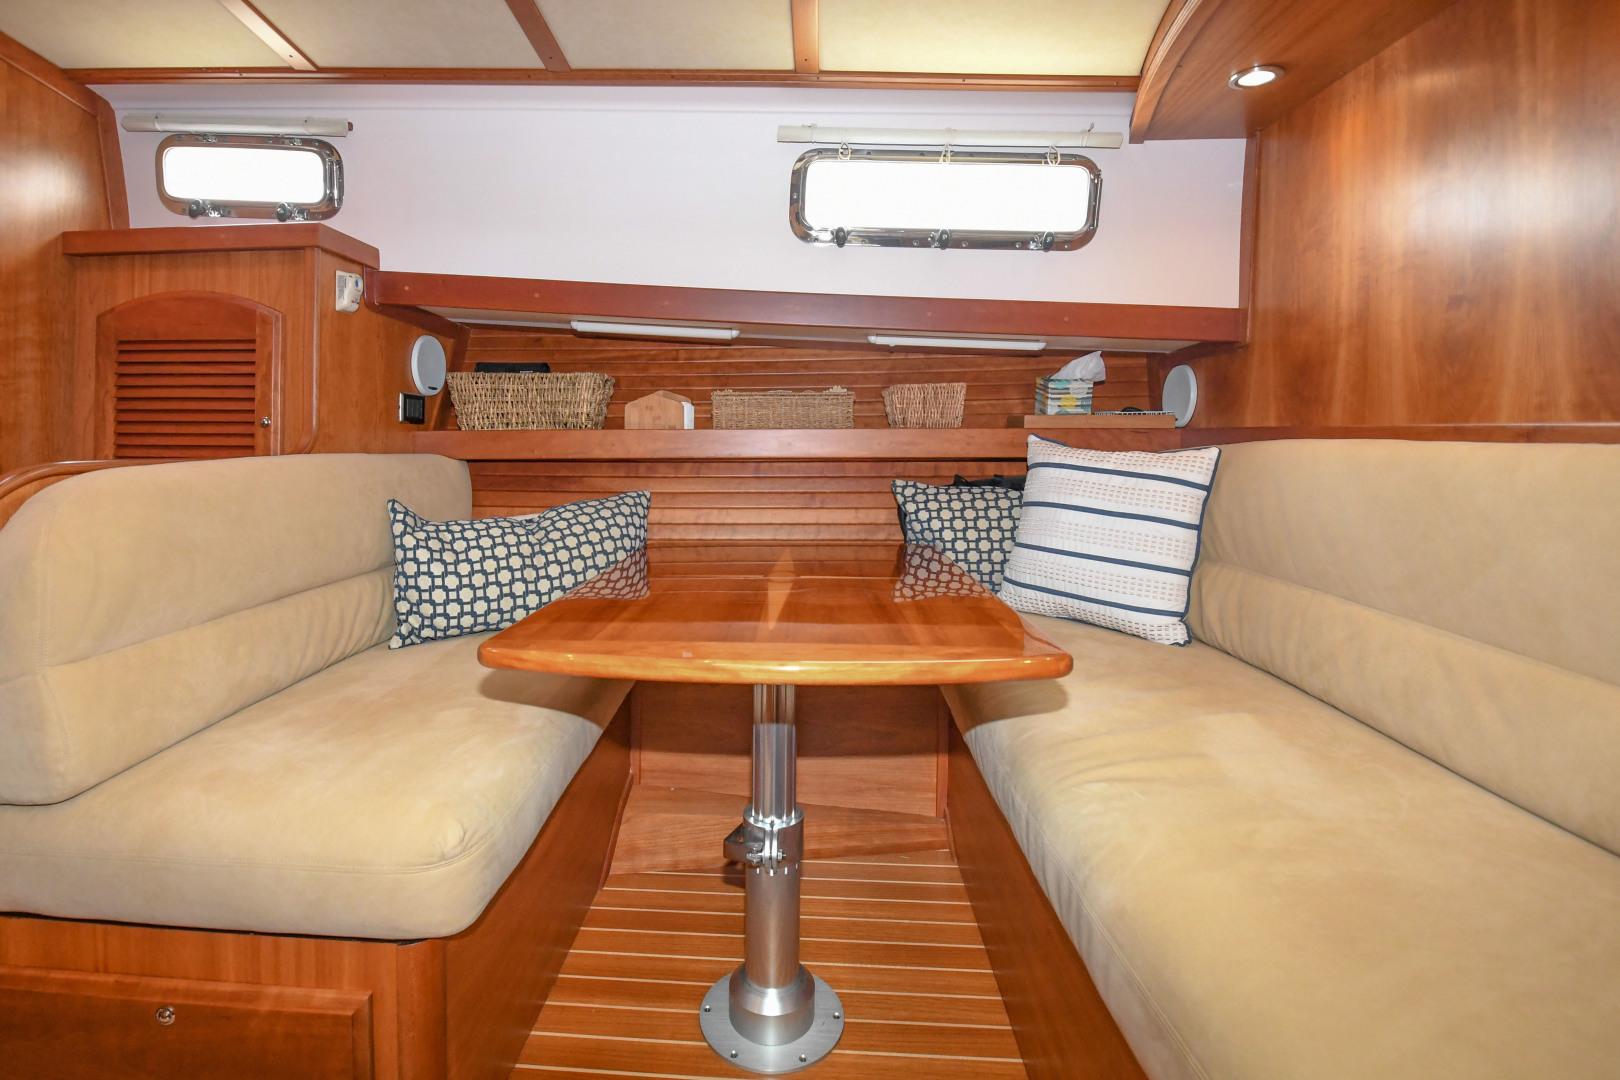 Sabre-40 Express 2010-Impulse Treasure Island-Florida-United States-2010 40 Sabre Express  Impulse  Lower Dinette-1618621 | Thumbnail